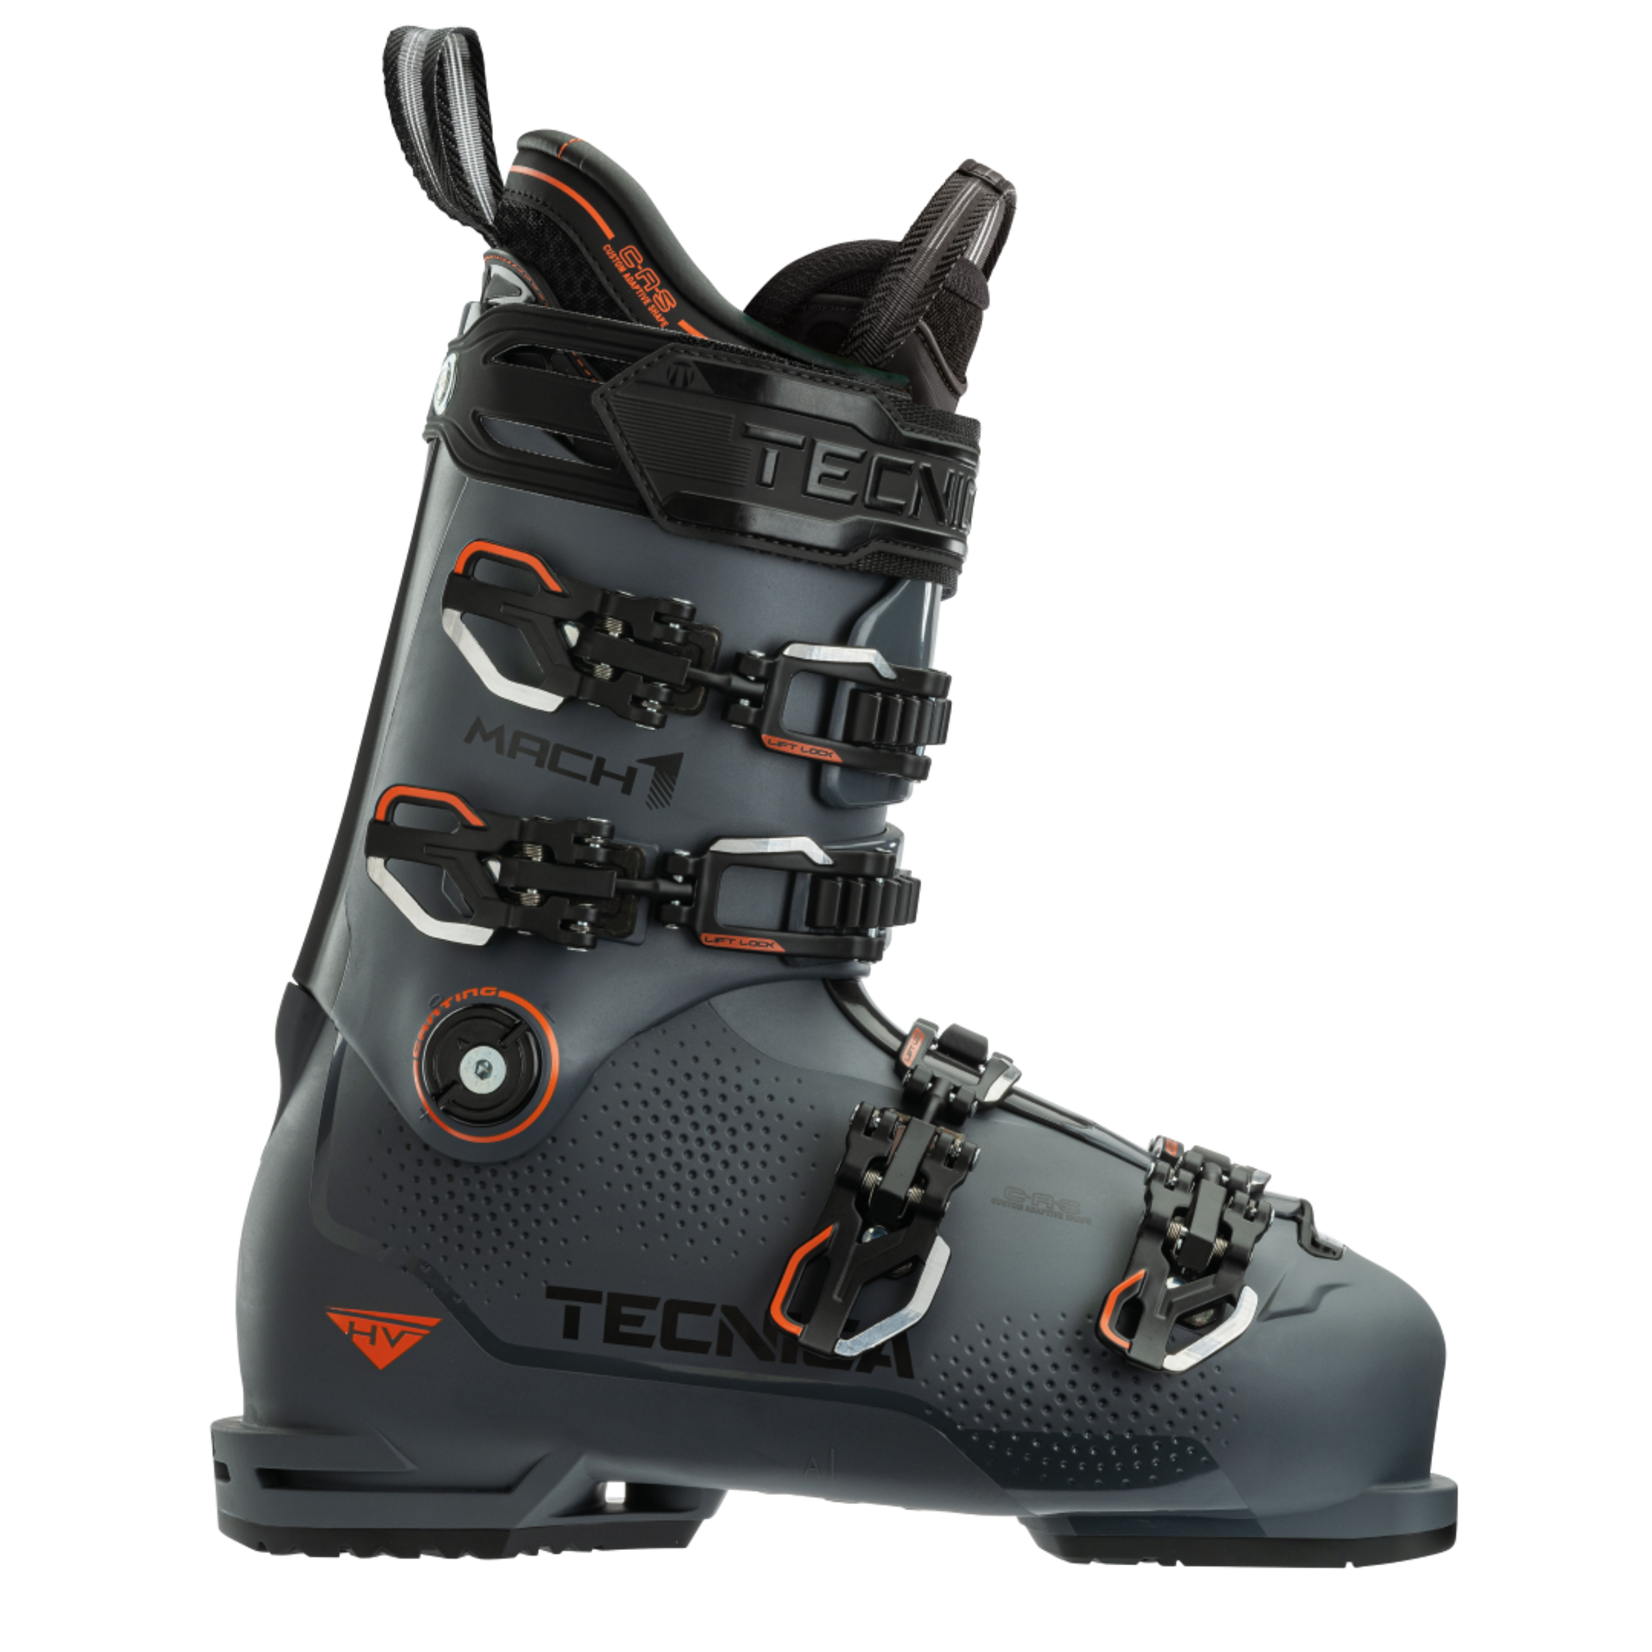 Tecnica Botte de ski Tecnica Mach1  HV 110 - Homme